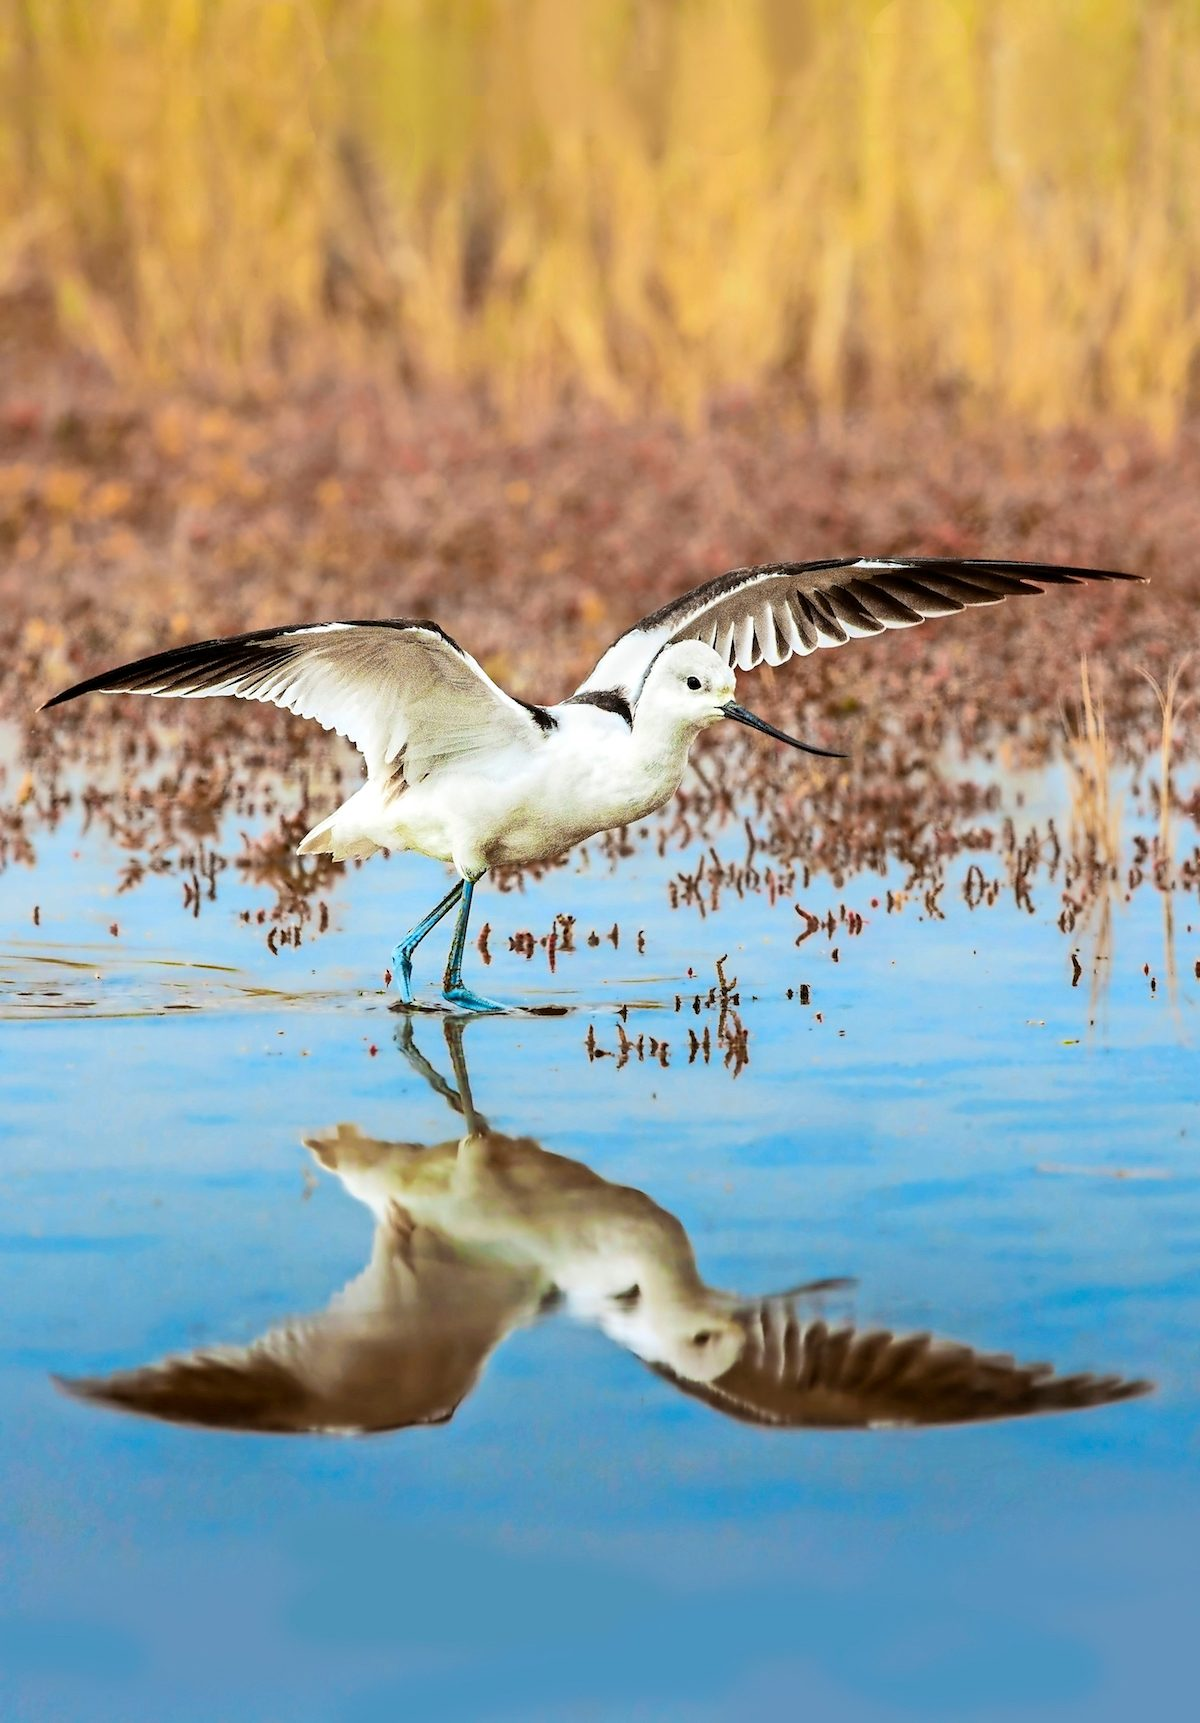 American avocet spreading its wings.